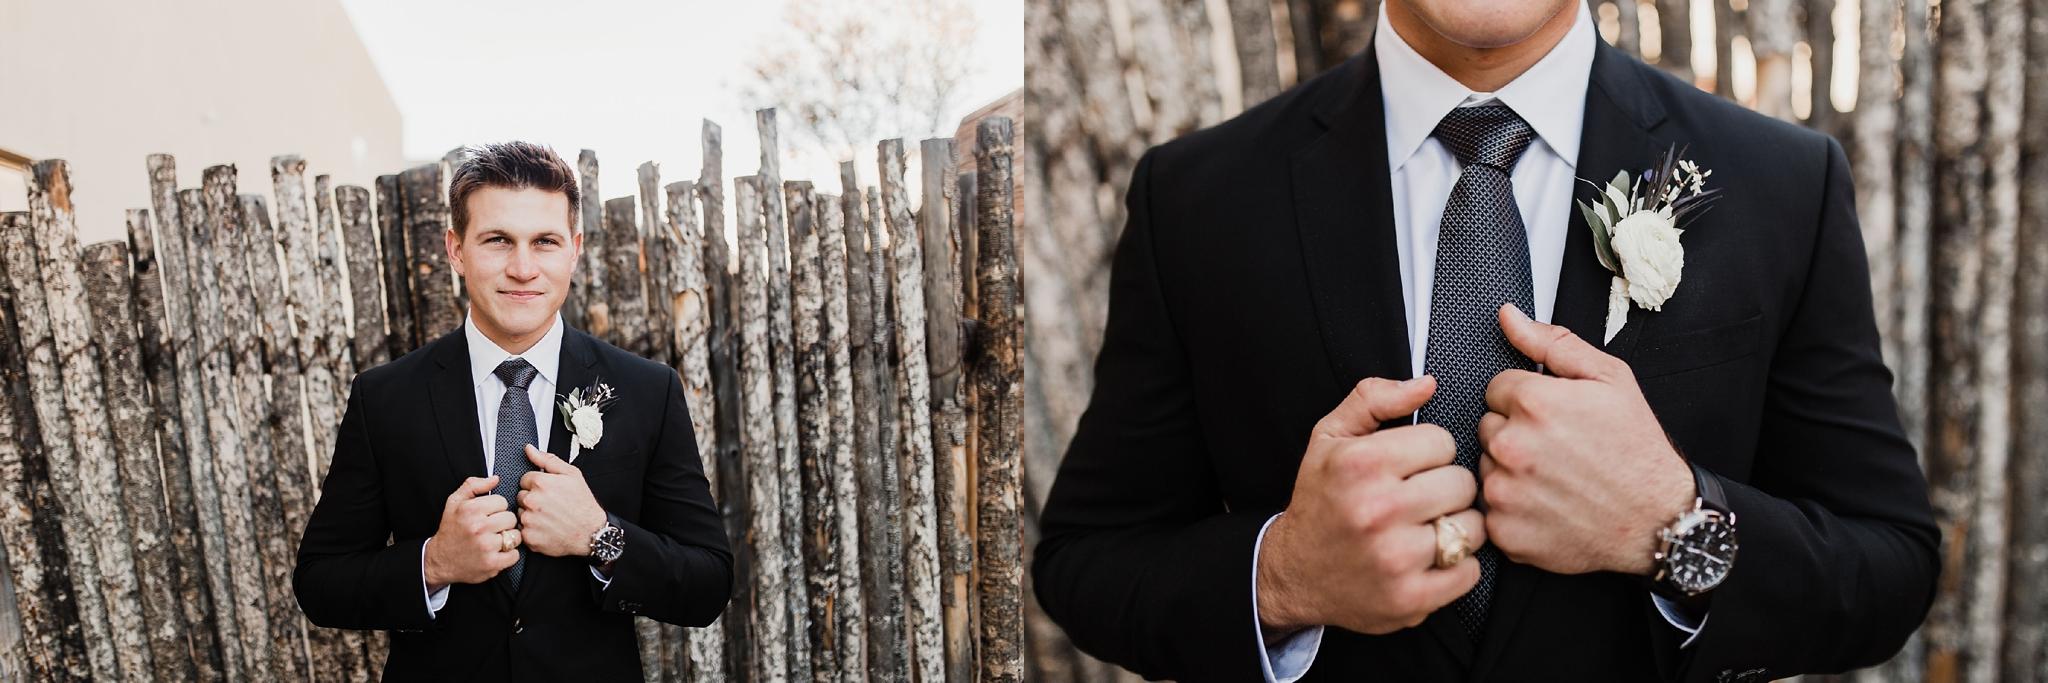 Alicia+lucia+photography+-+albuquerque+wedding+photographer+-+santa+fe+wedding+photography+-+new+mexico+wedding+photographer+-+new+mexico+wedding+-+wedding+-+groom+-+groom+style+-+wedding+style_0017.jpg